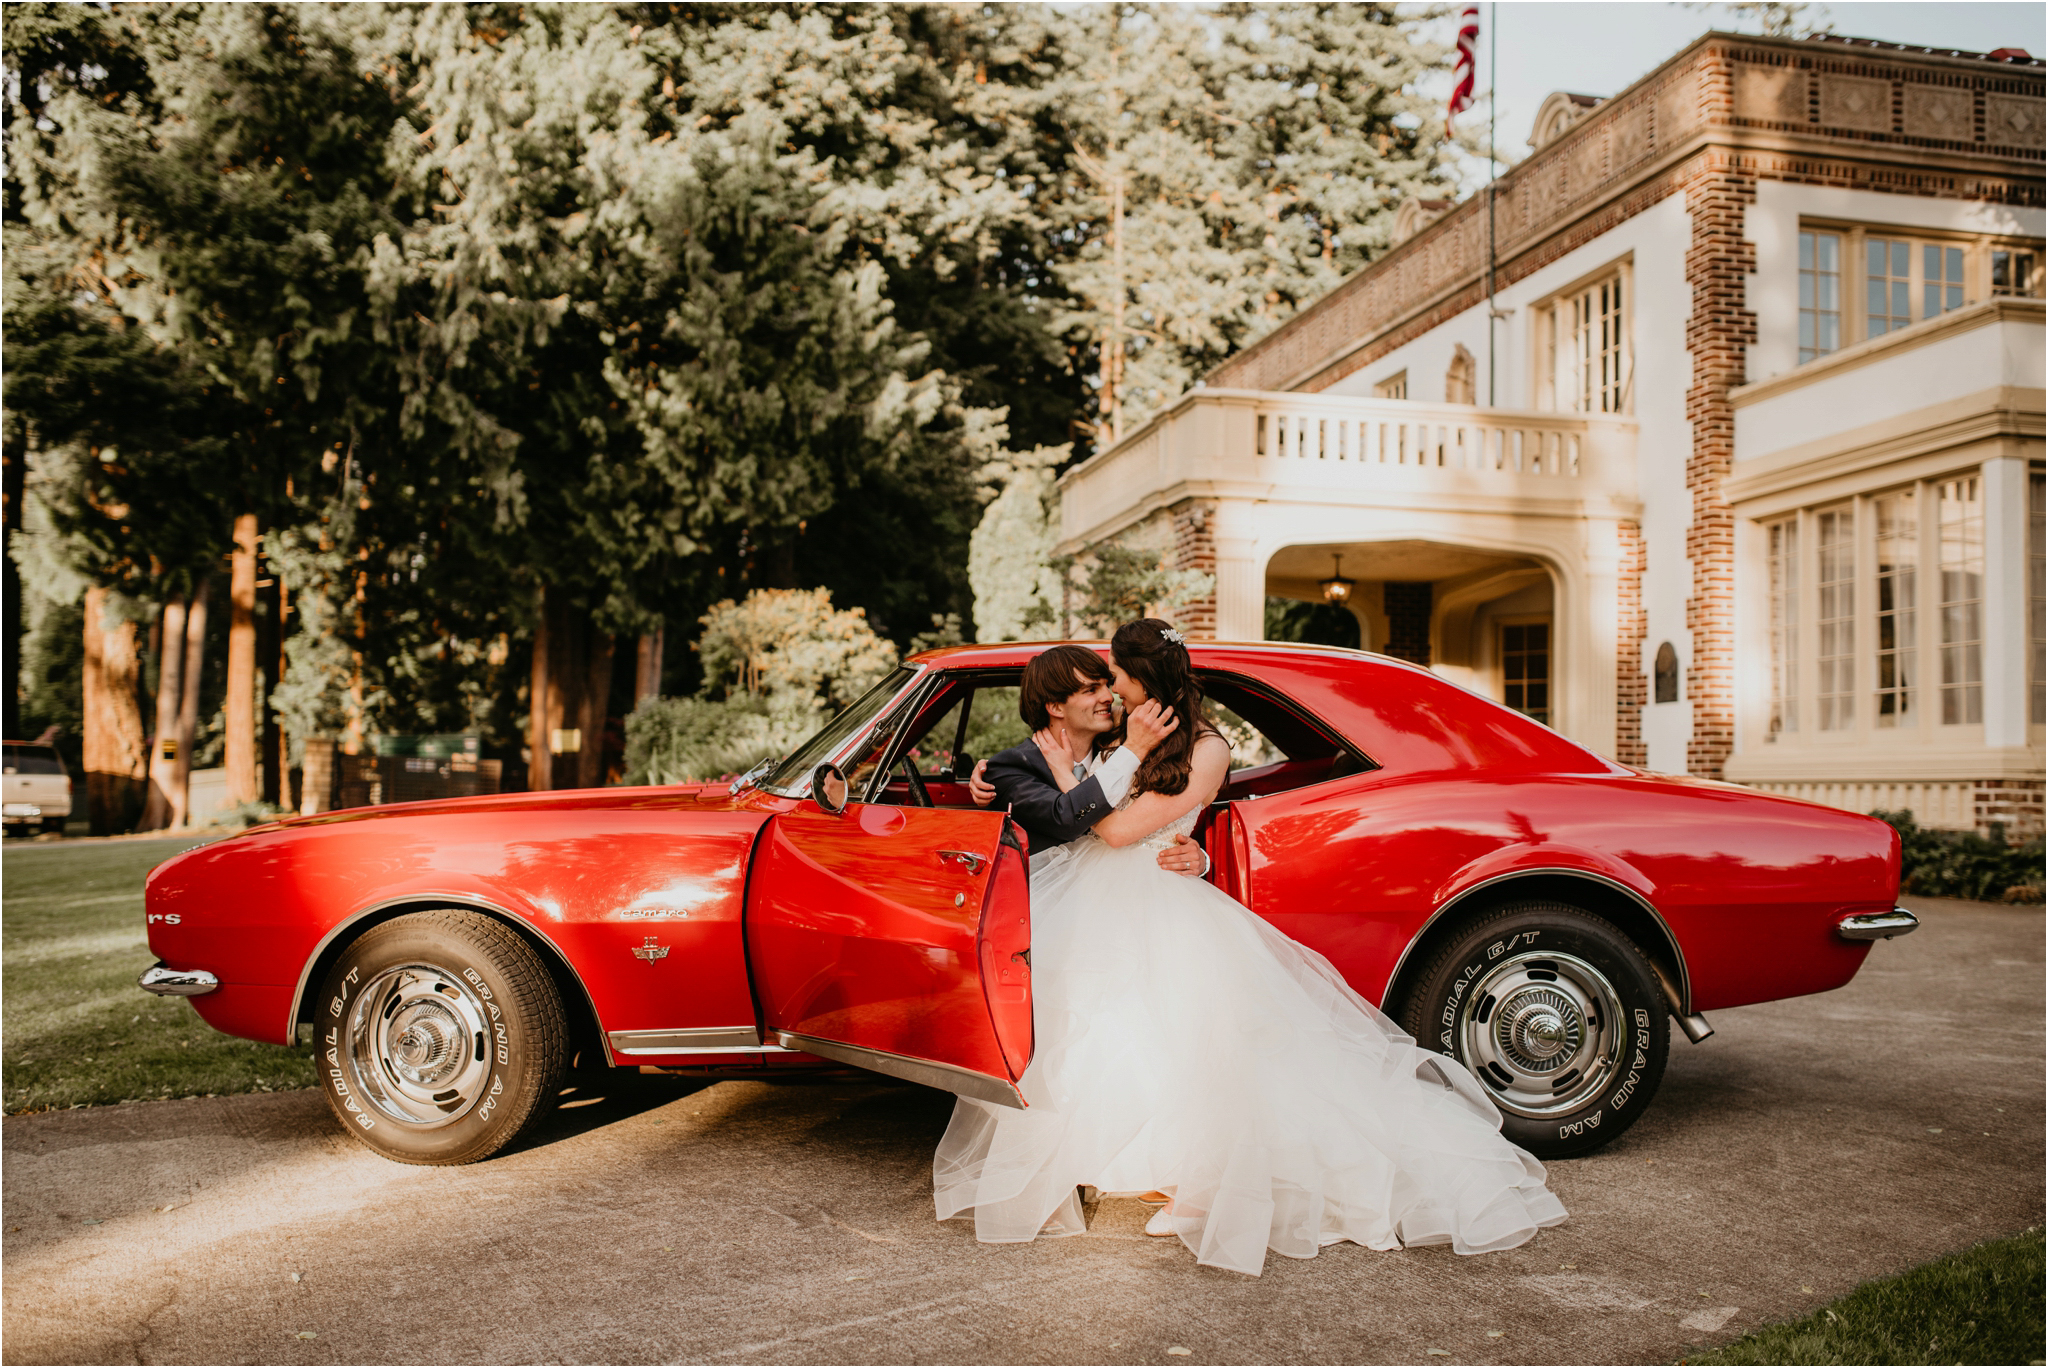 chance-and-ondrea-lairmont-manor-wedding-seattle-photographer-107.jpg